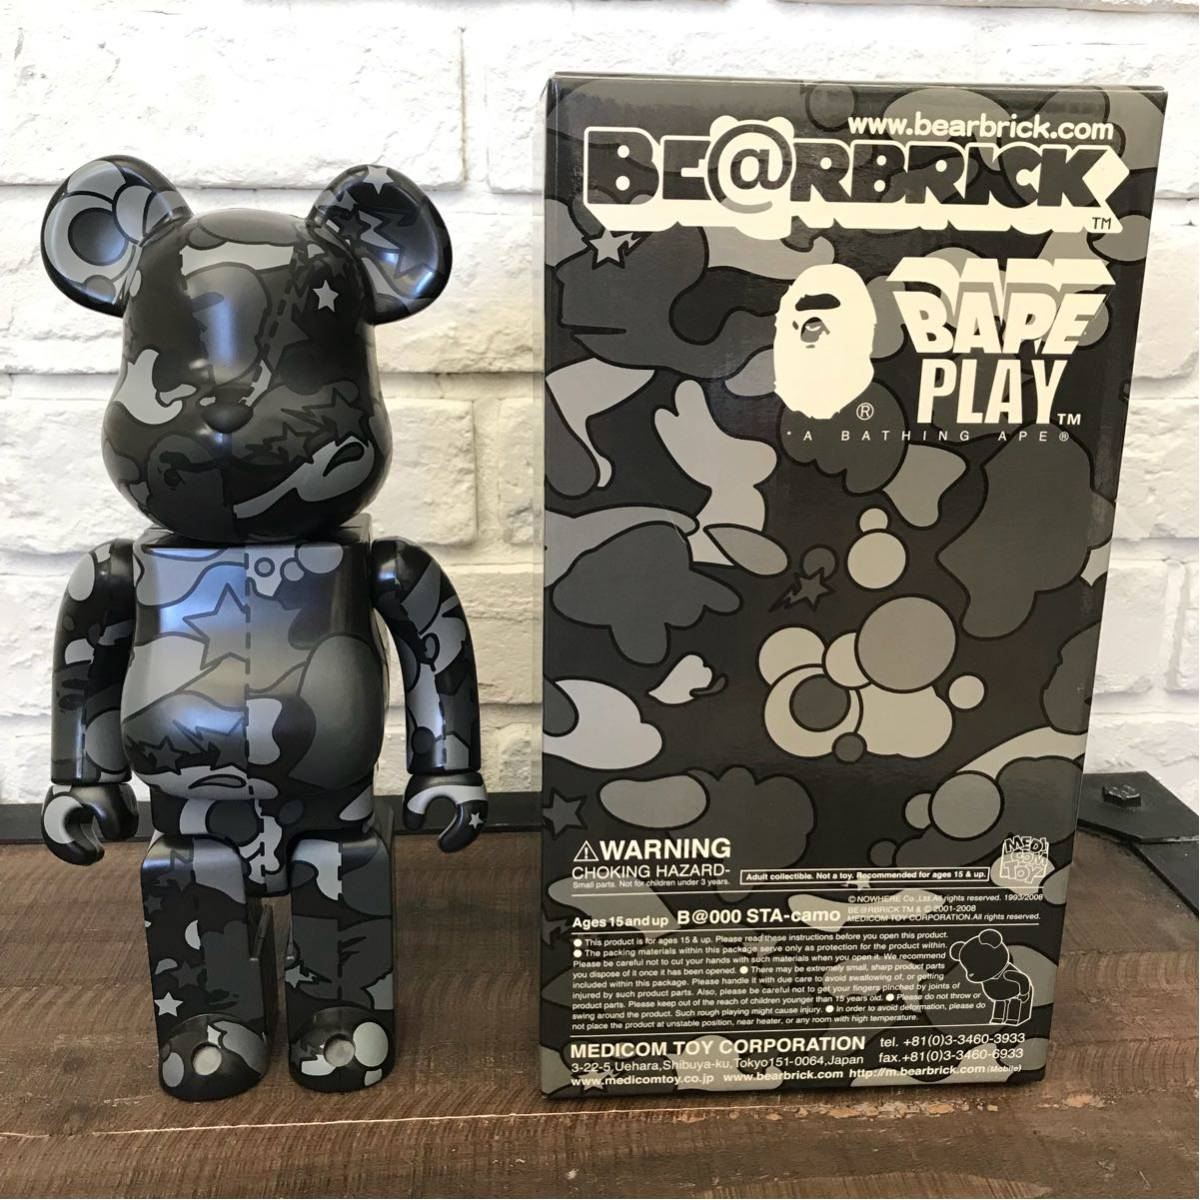 sta camo 400% BE@RBRICK black medicom toy a bathing ape bape ベアブリック メディコムトイ エイプ ベイプ アベイシングエイプ psyche